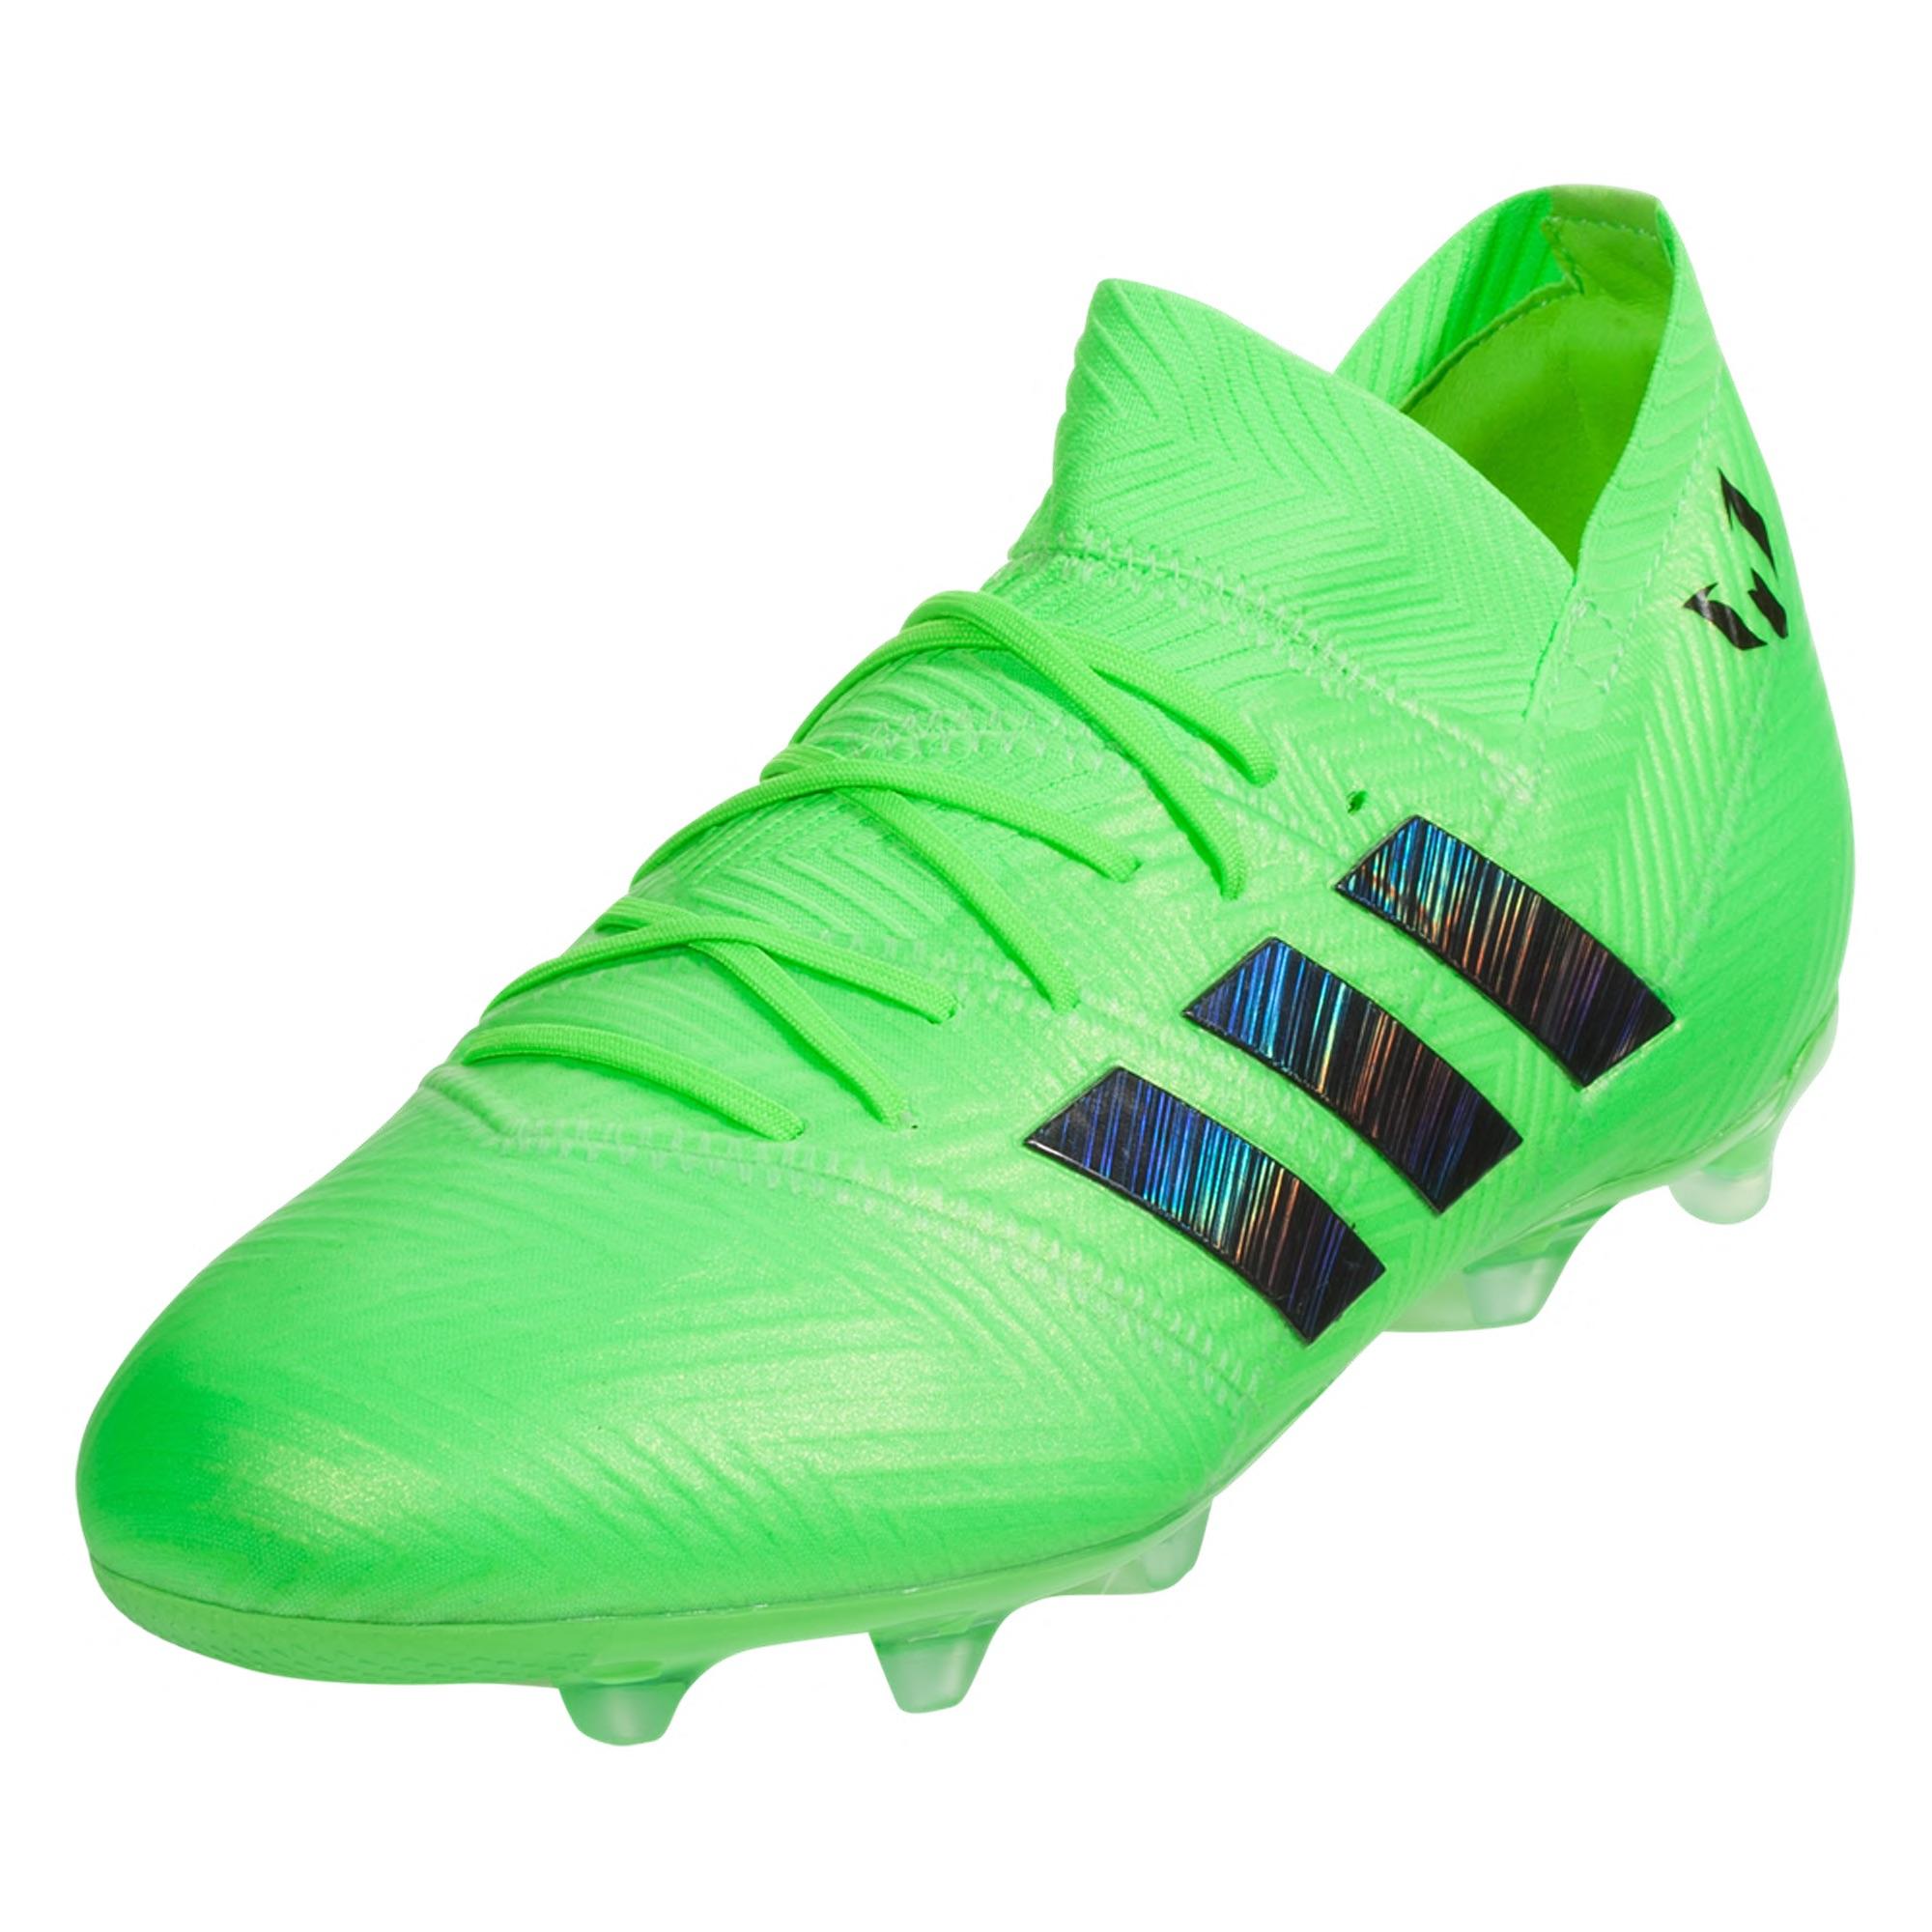 c1dcf582d Adidas Nemeziz Messi 18.1 FG Soccer Cleats – Solar Green Core Black Solar  Green